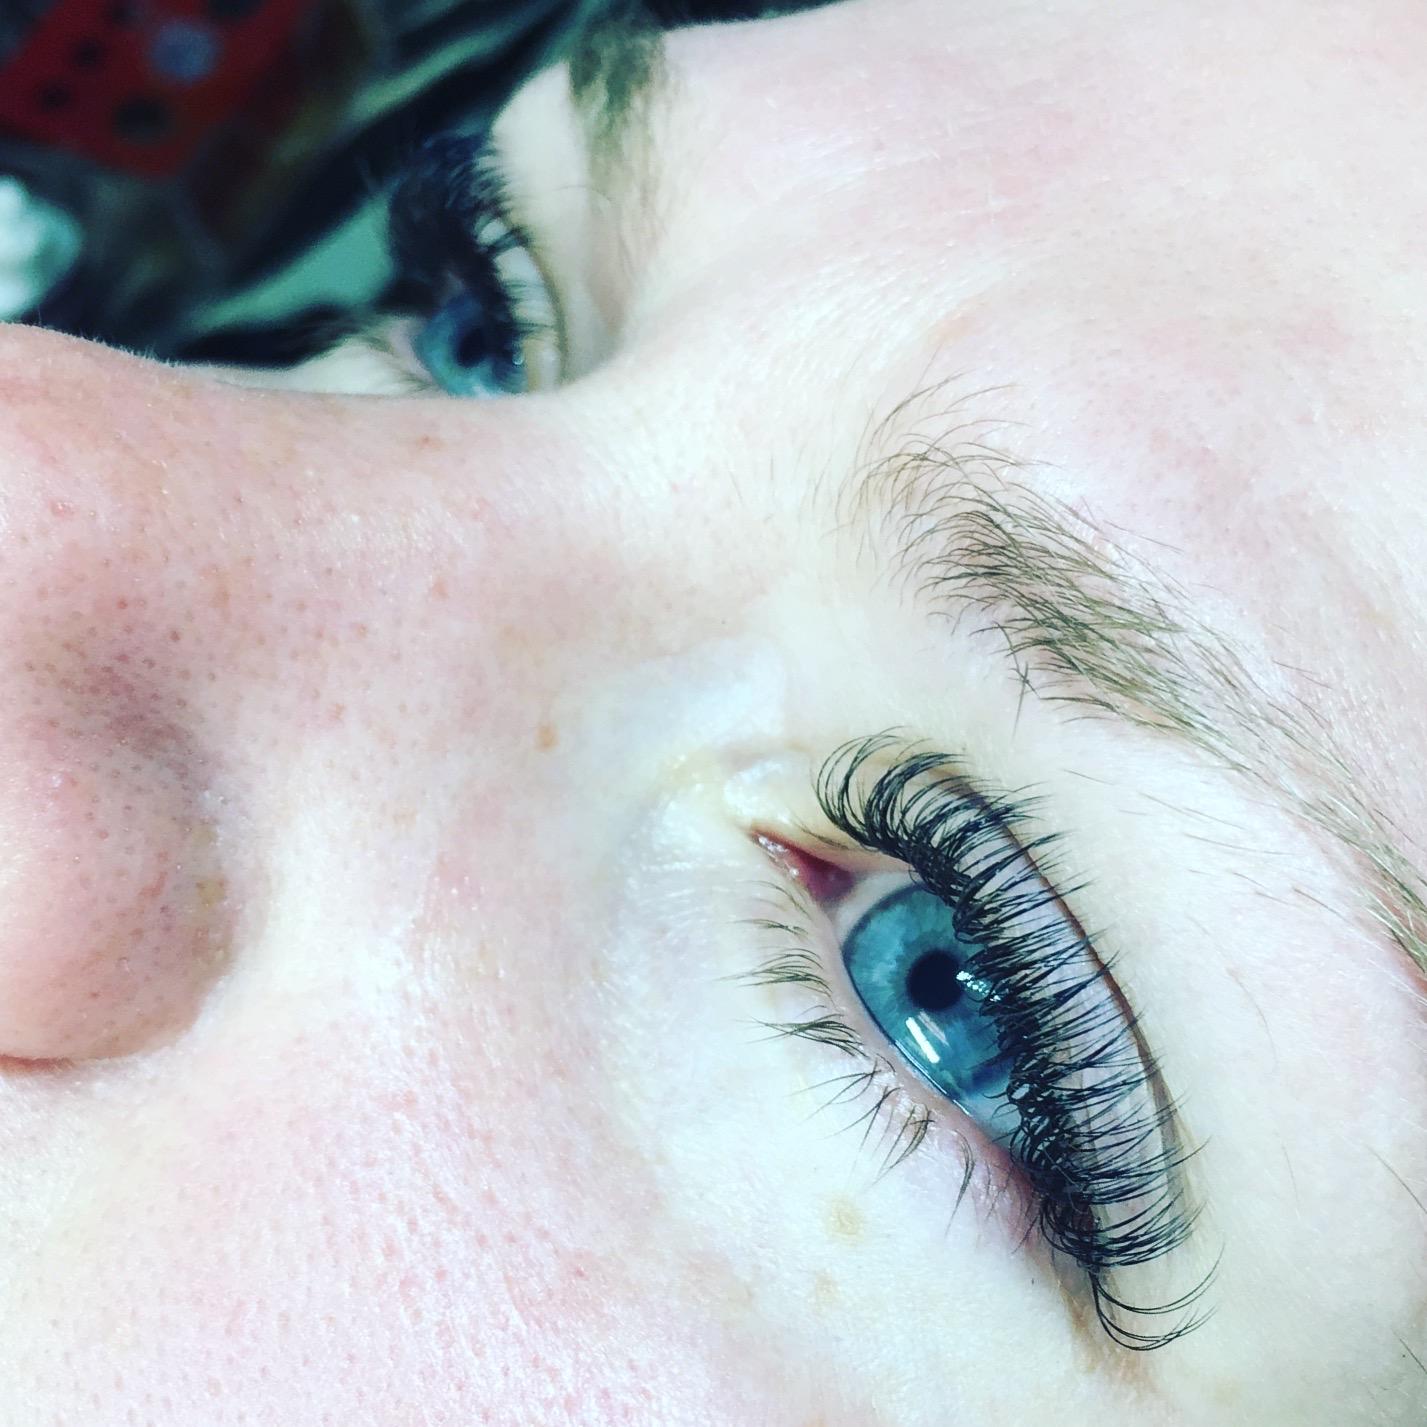 Eyelash Extensions, Bella Beauty, 2D, 3D/4D, 5D+ Volume Lashes - B